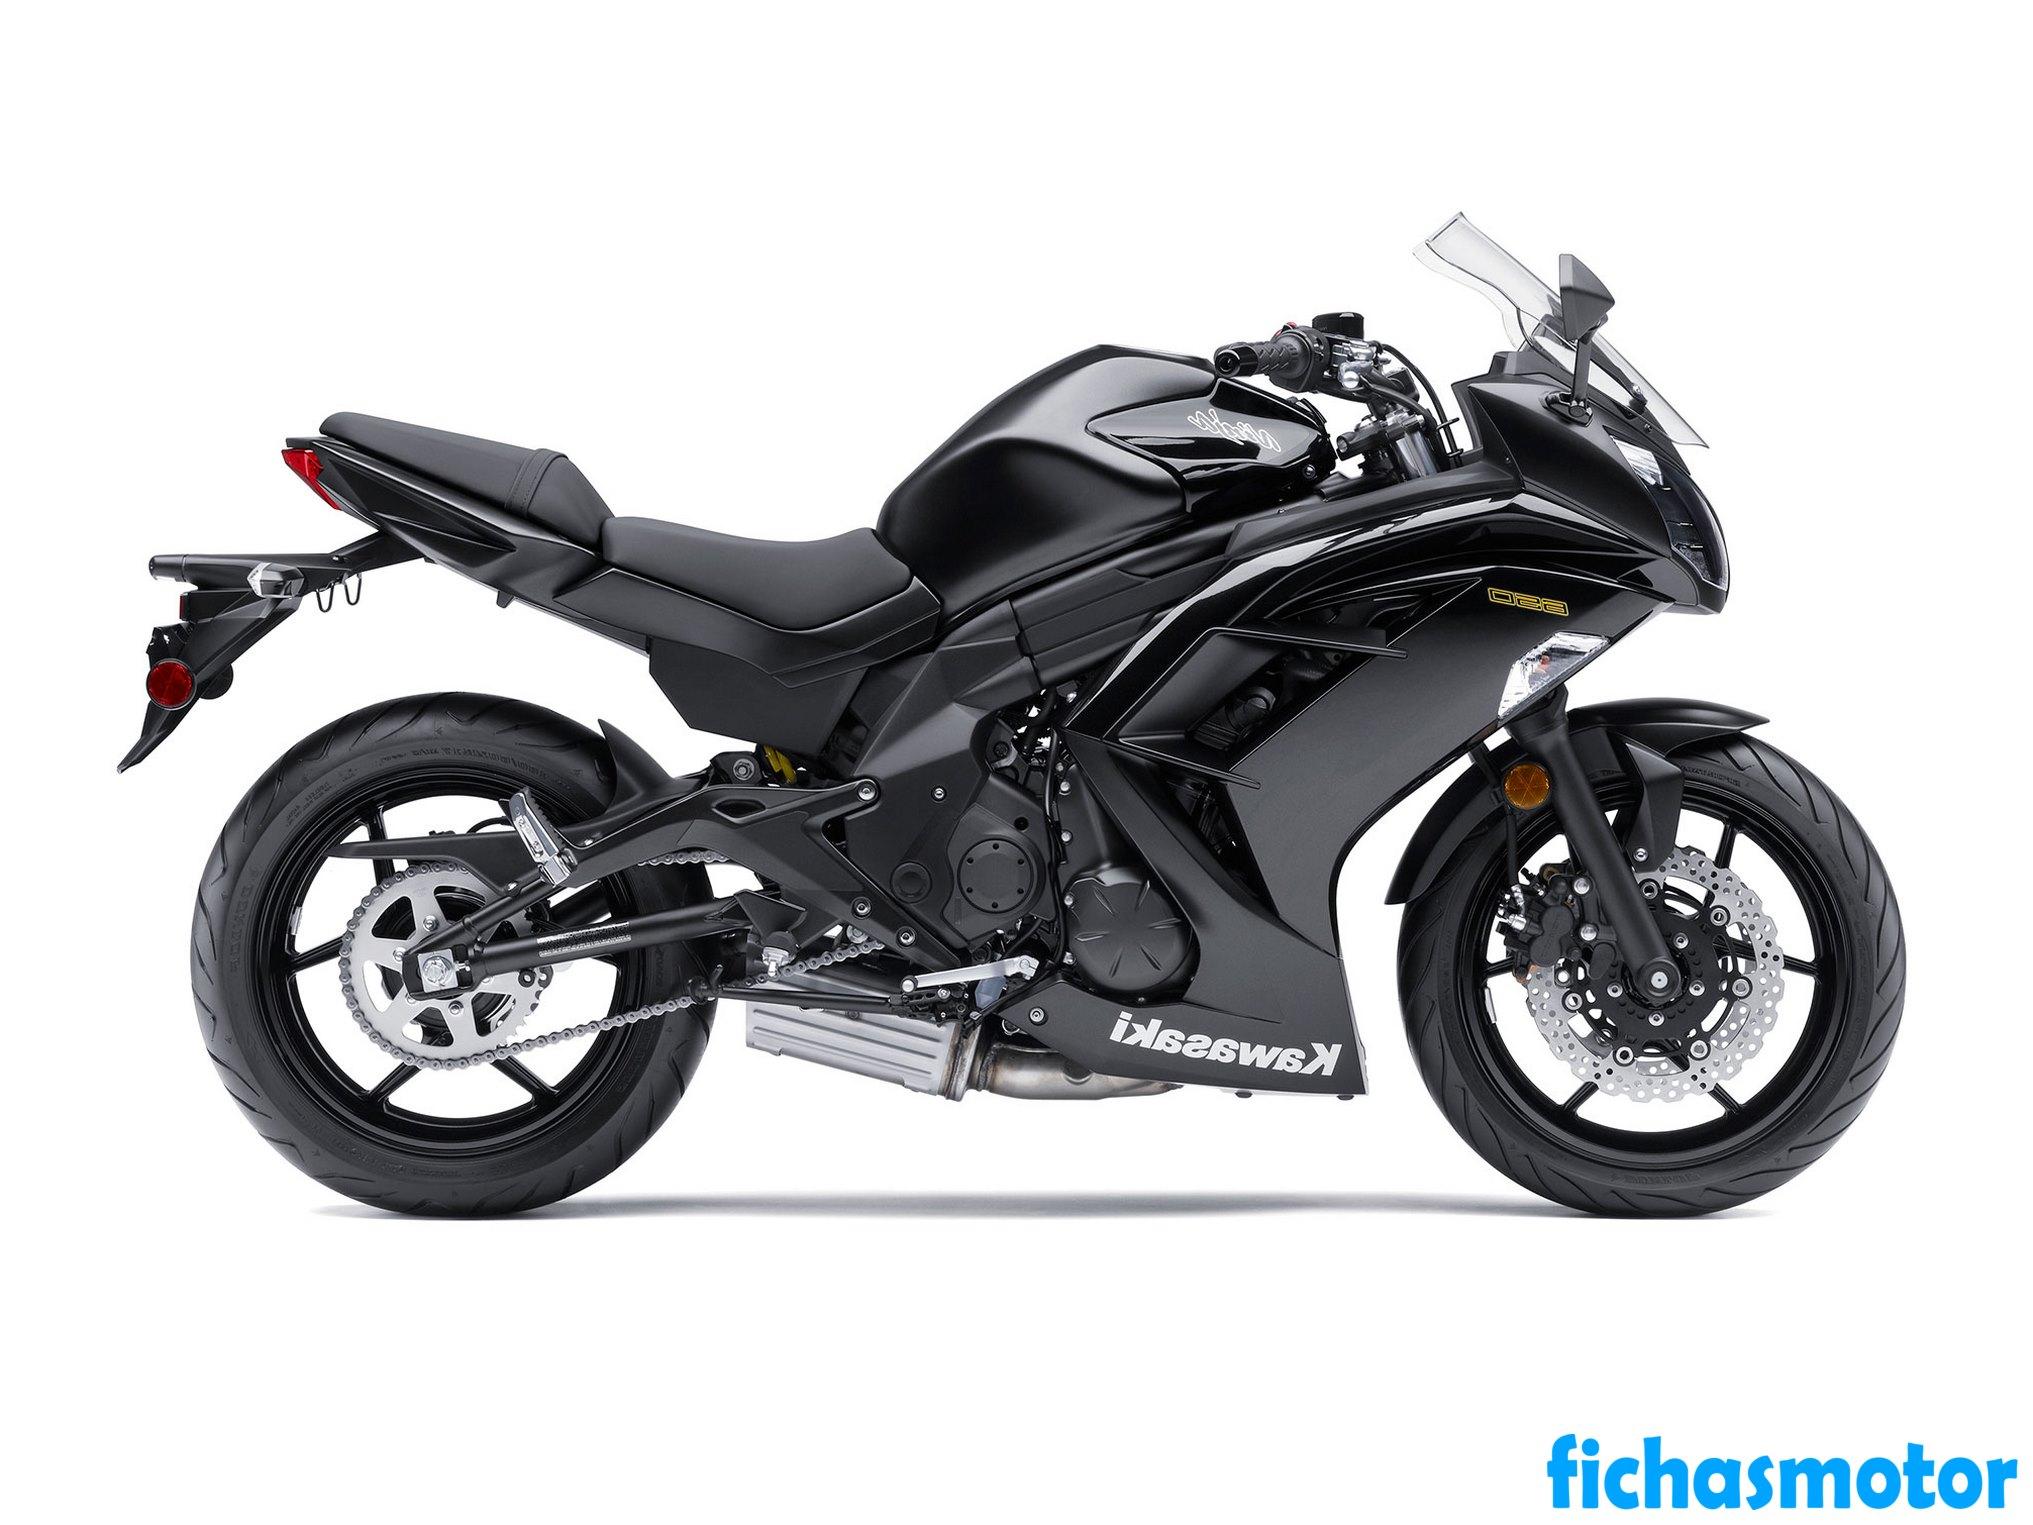 Imagen moto Kawasaki ninja 650 año 2013